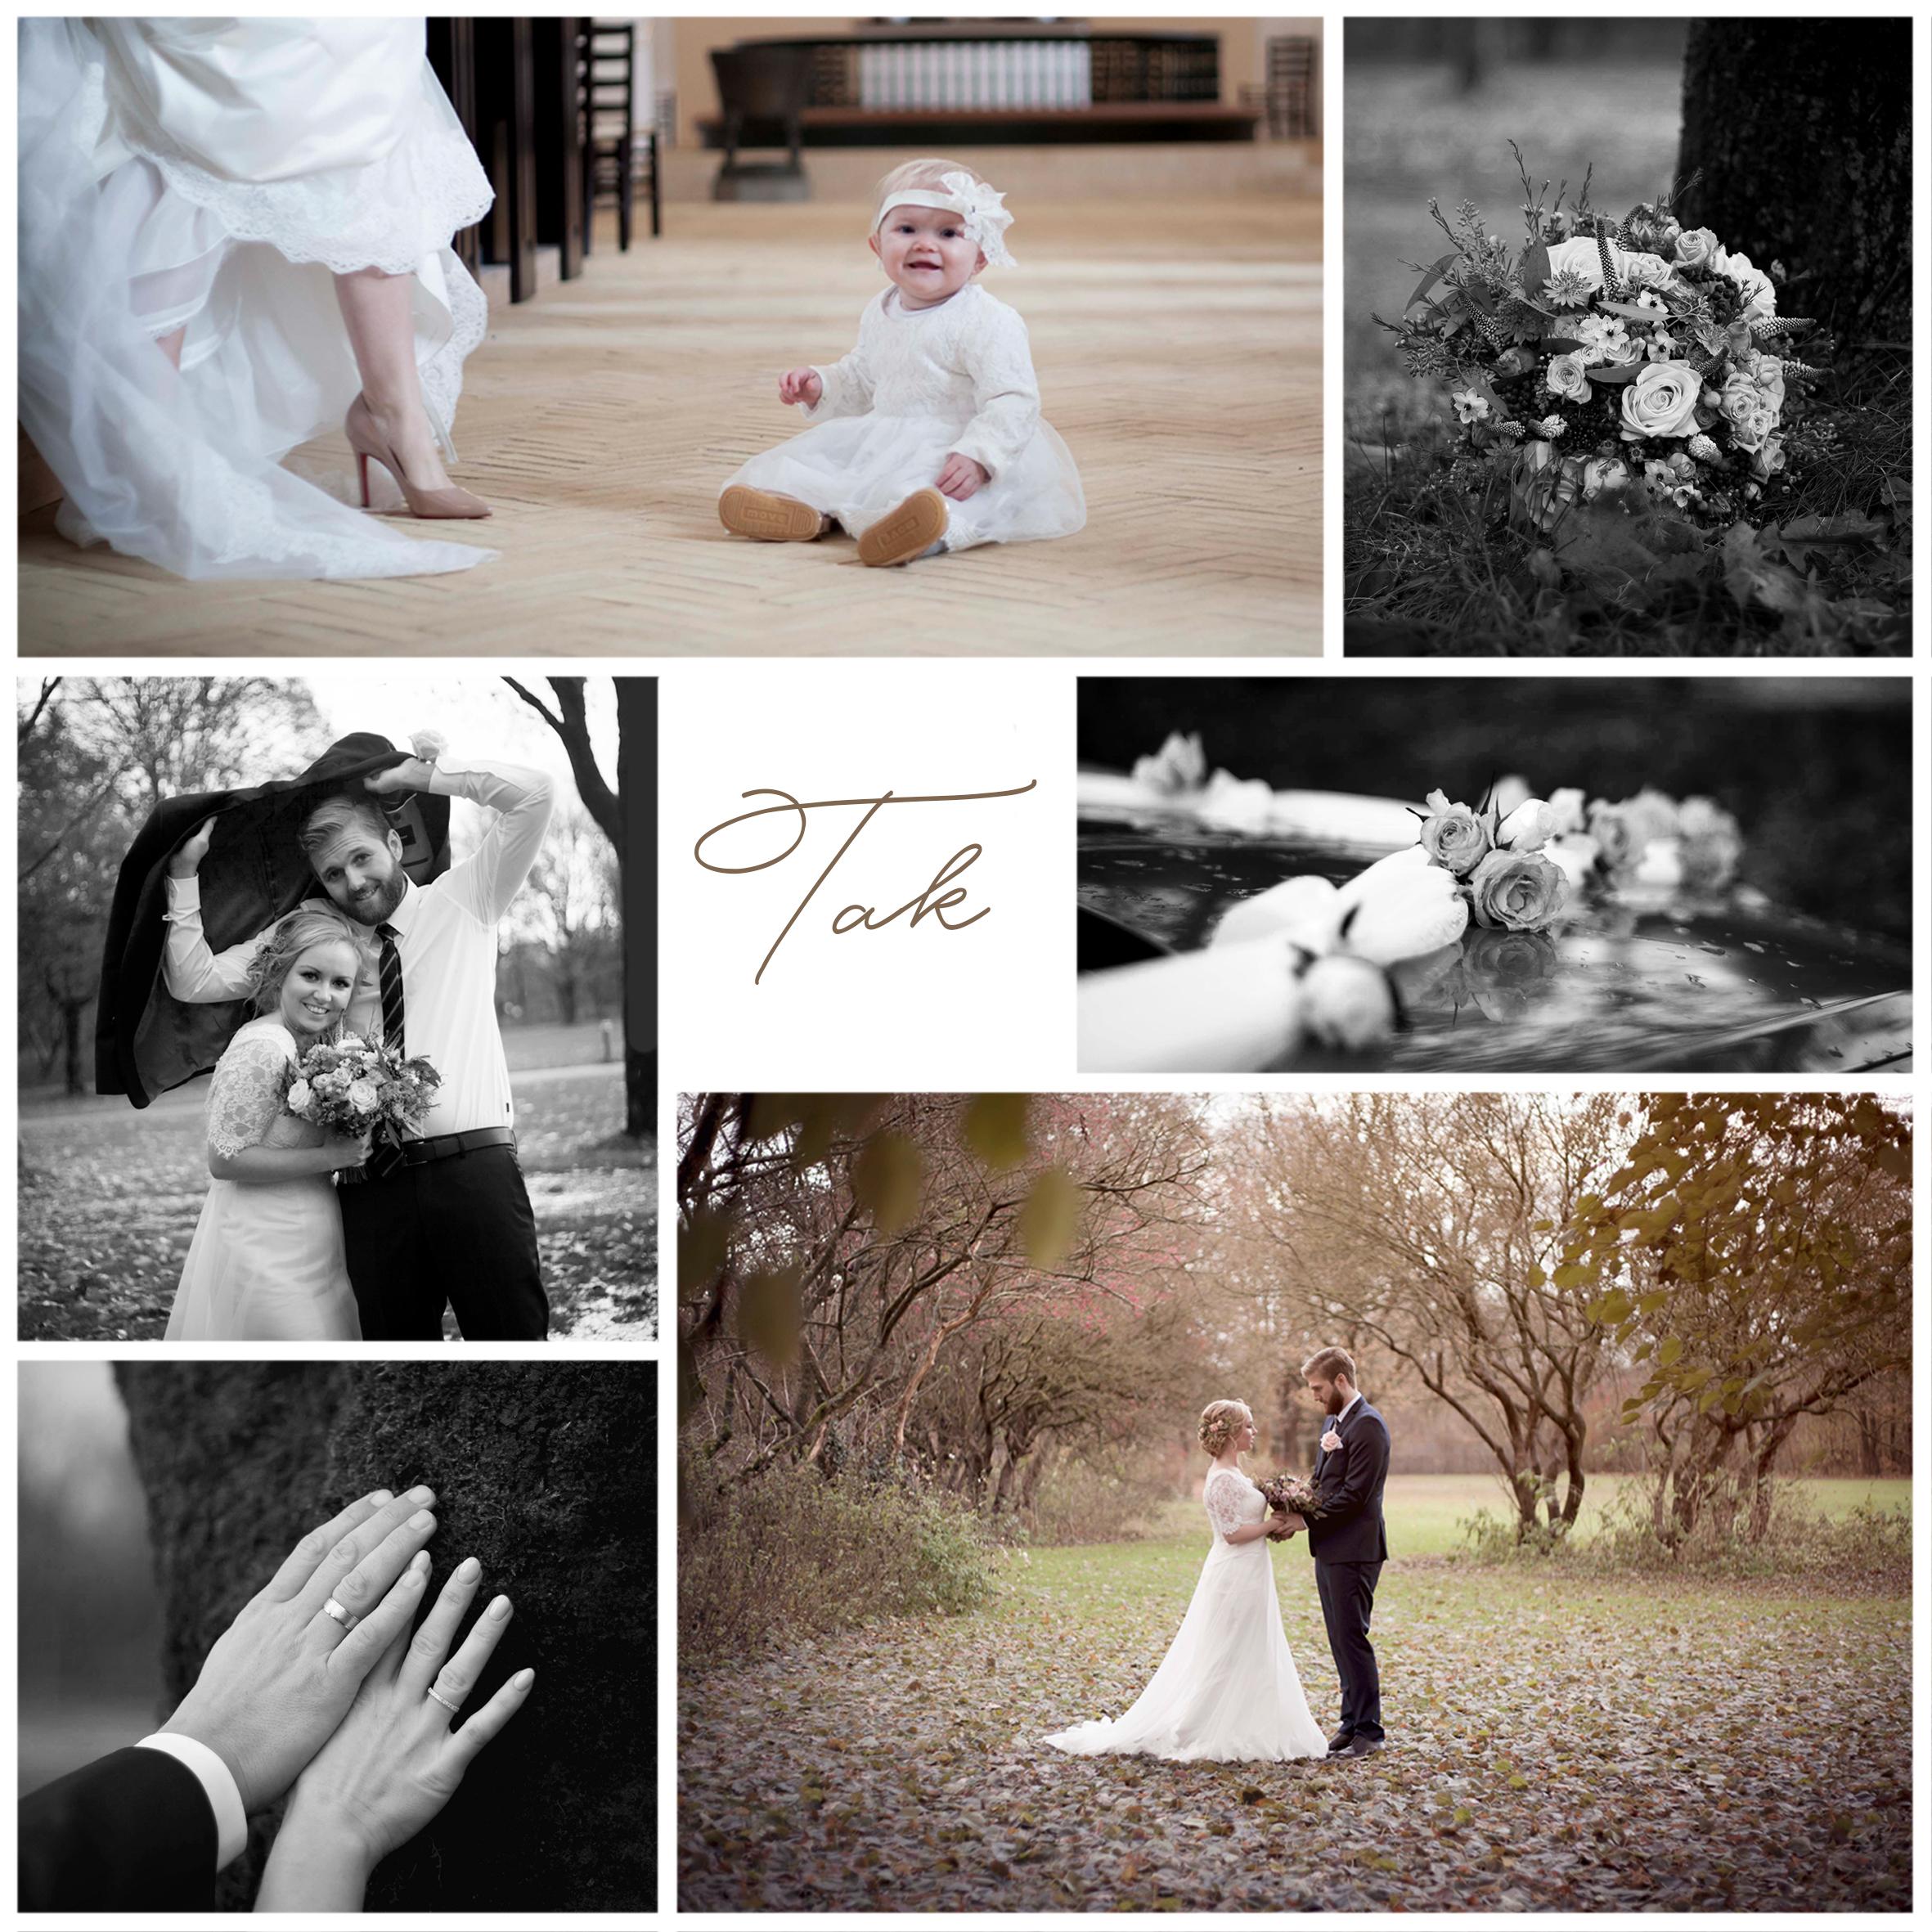 bryllupsfotografering takkekort